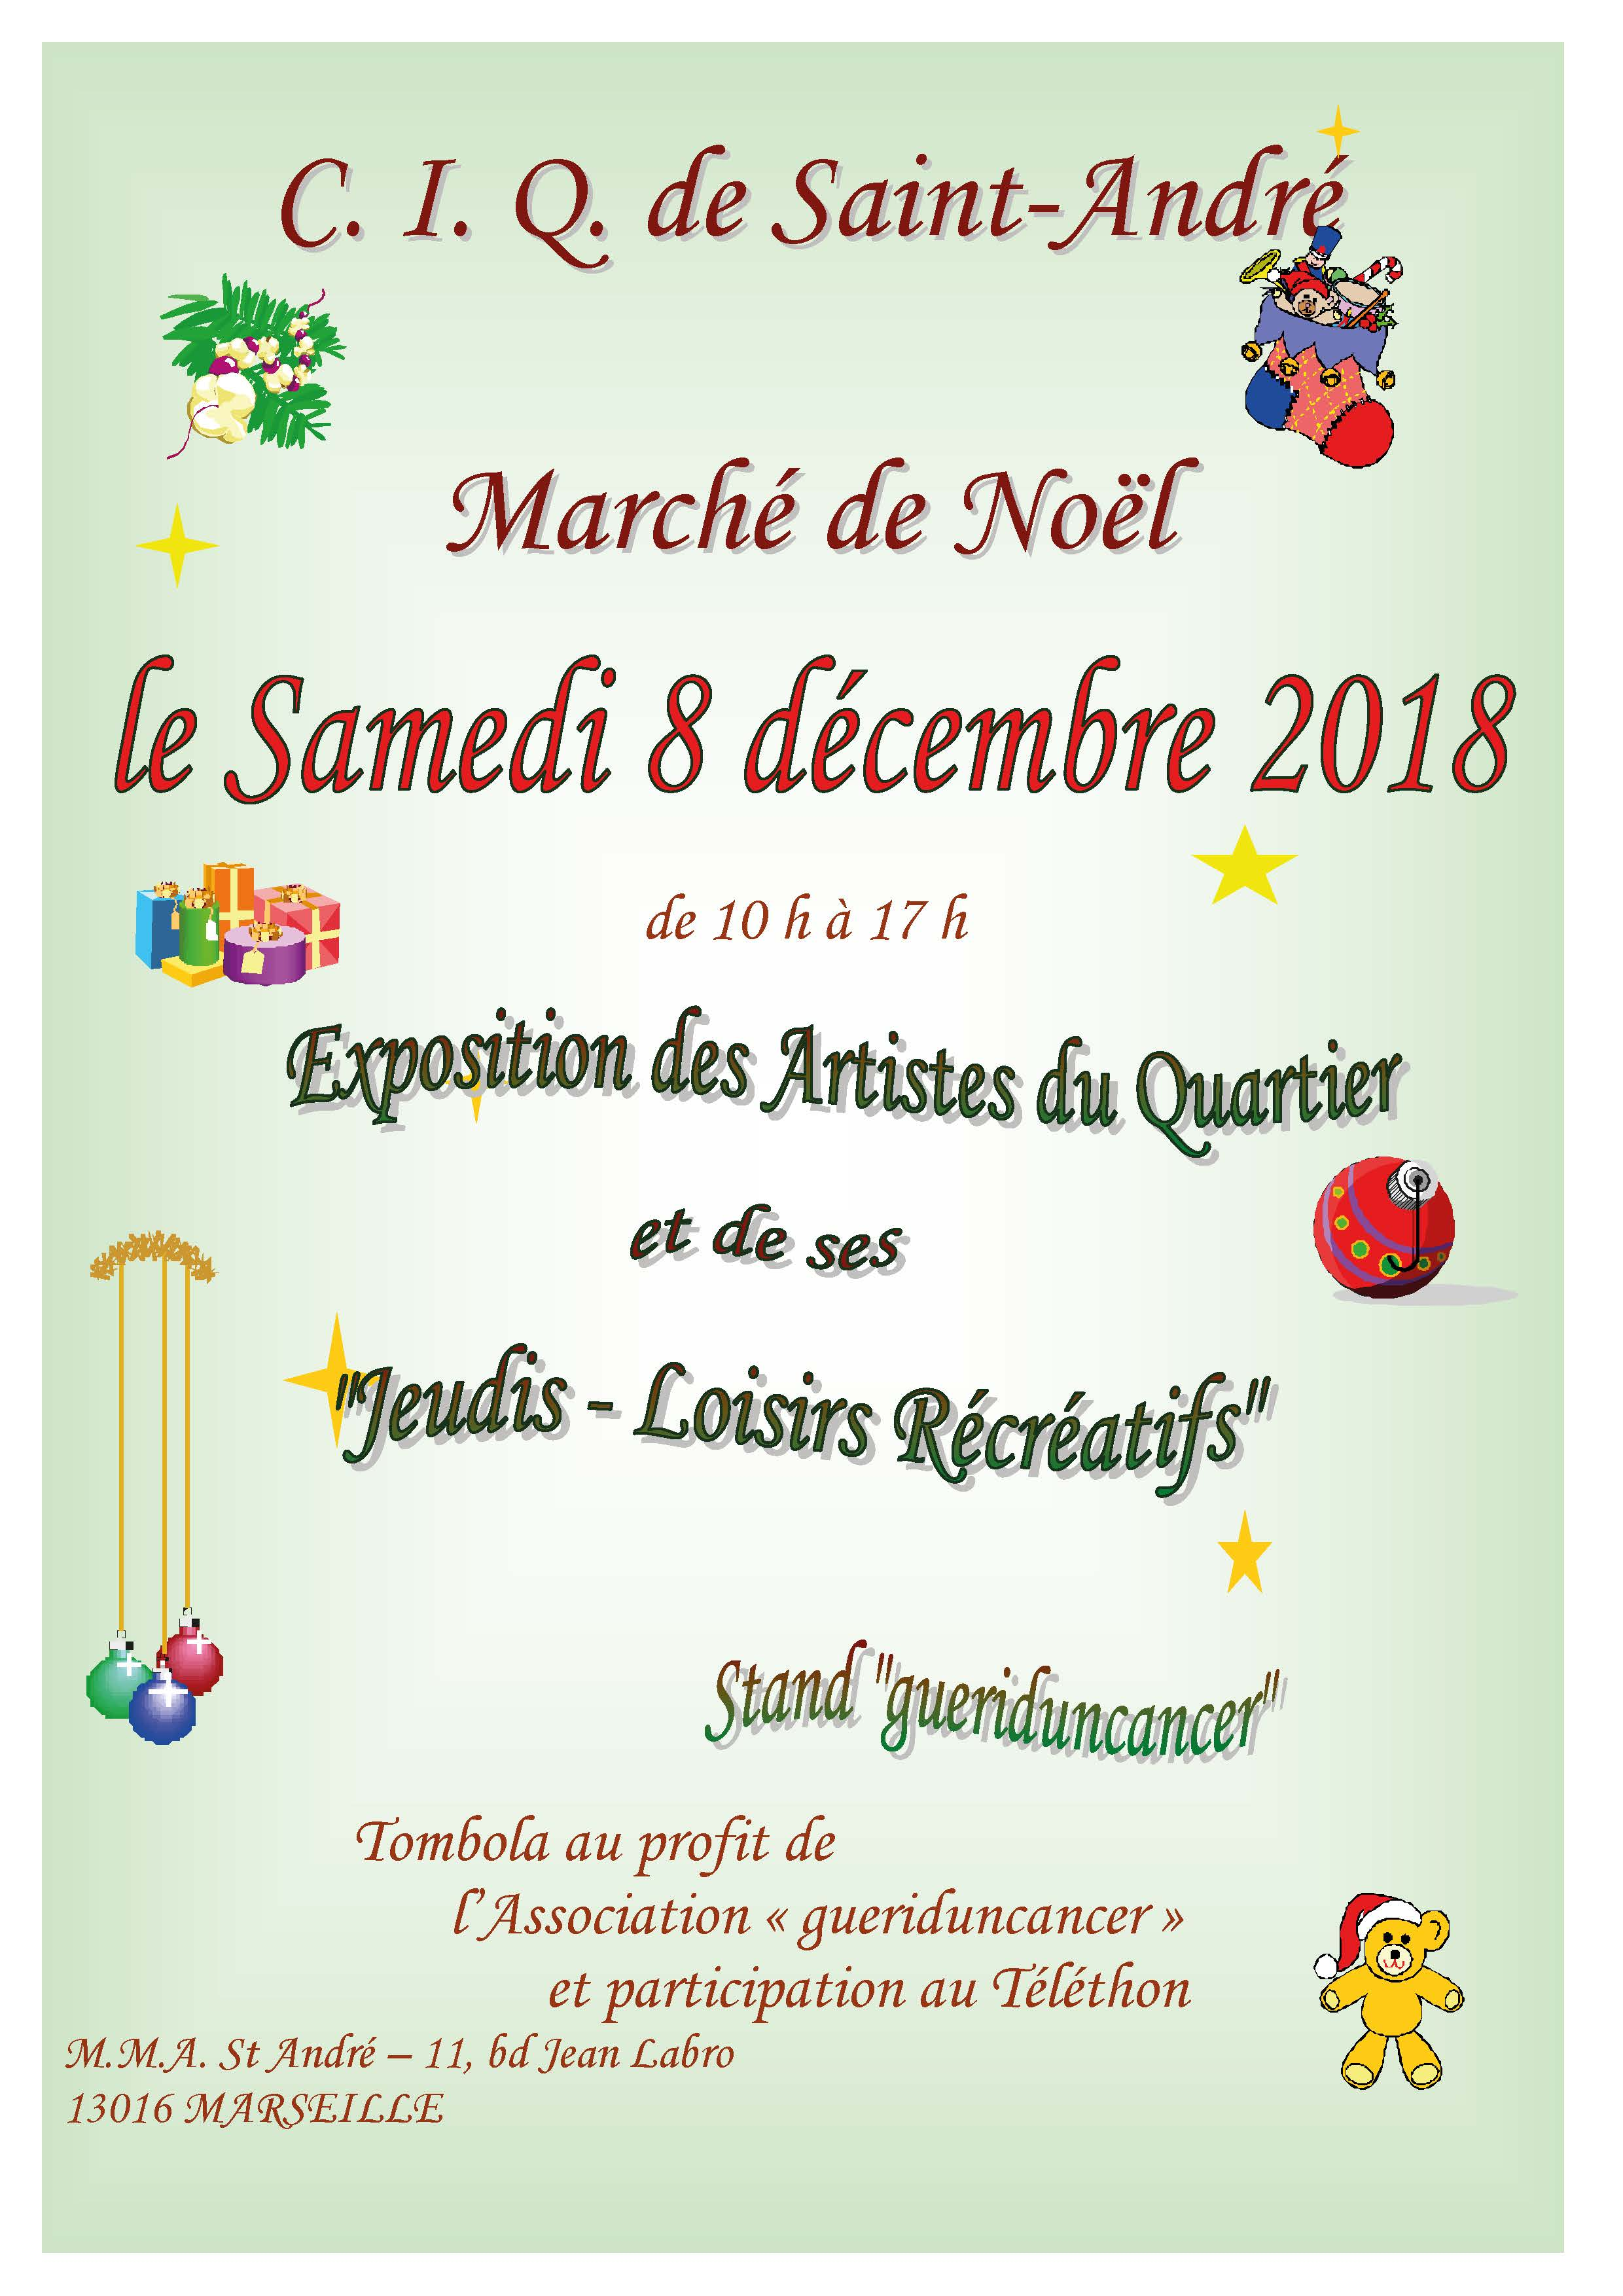 Marché de Noel 2018